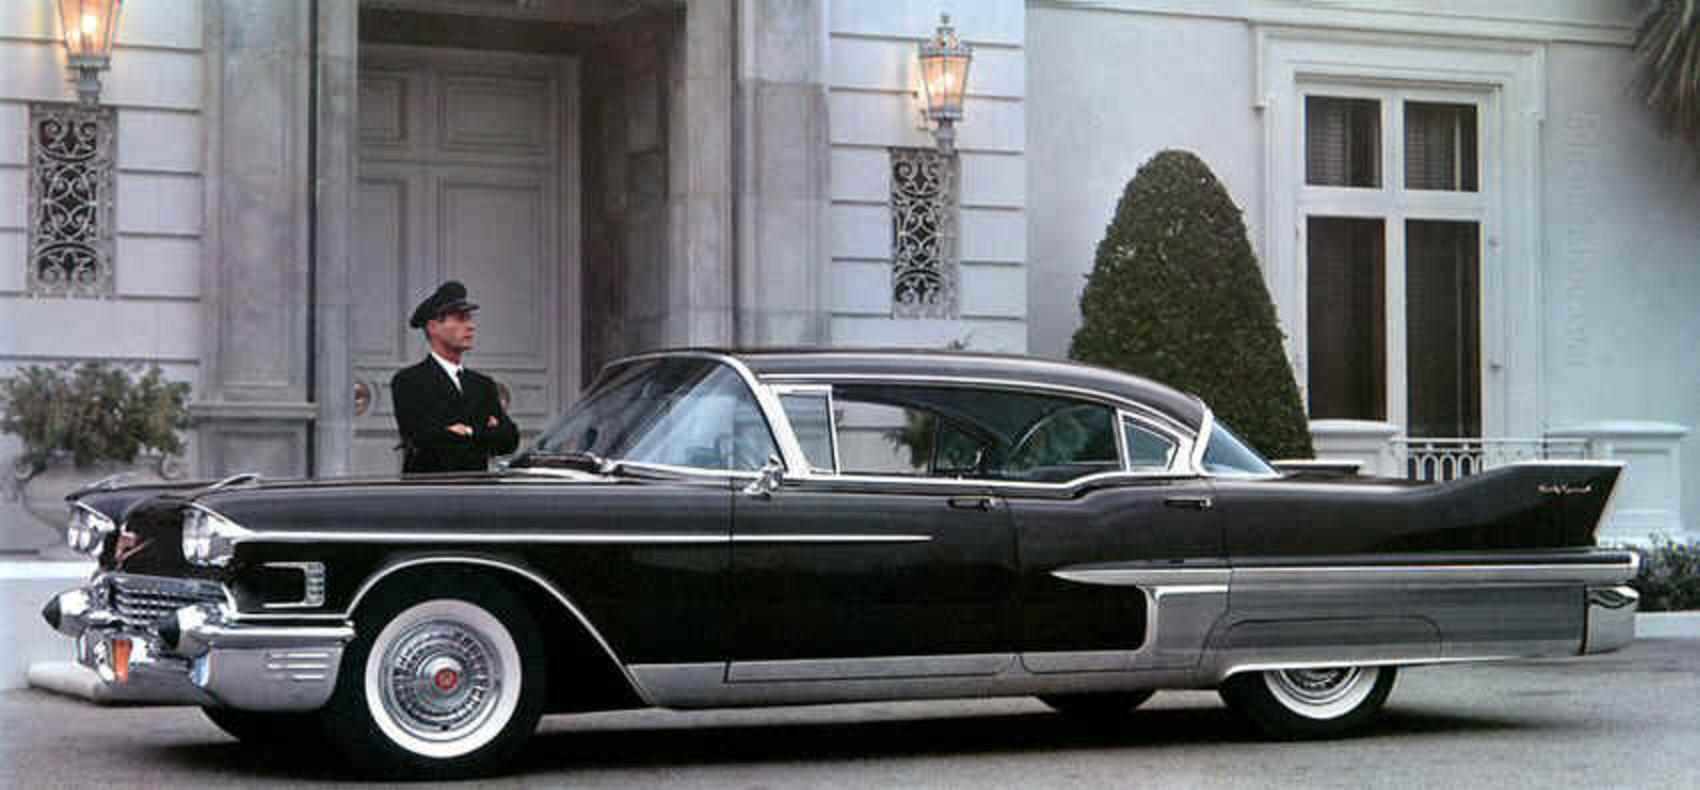 Topworldauto Photos Of Cadillac Fleetwood 60 Special Photo 1951 Brougham Cars Catalog Specs Features